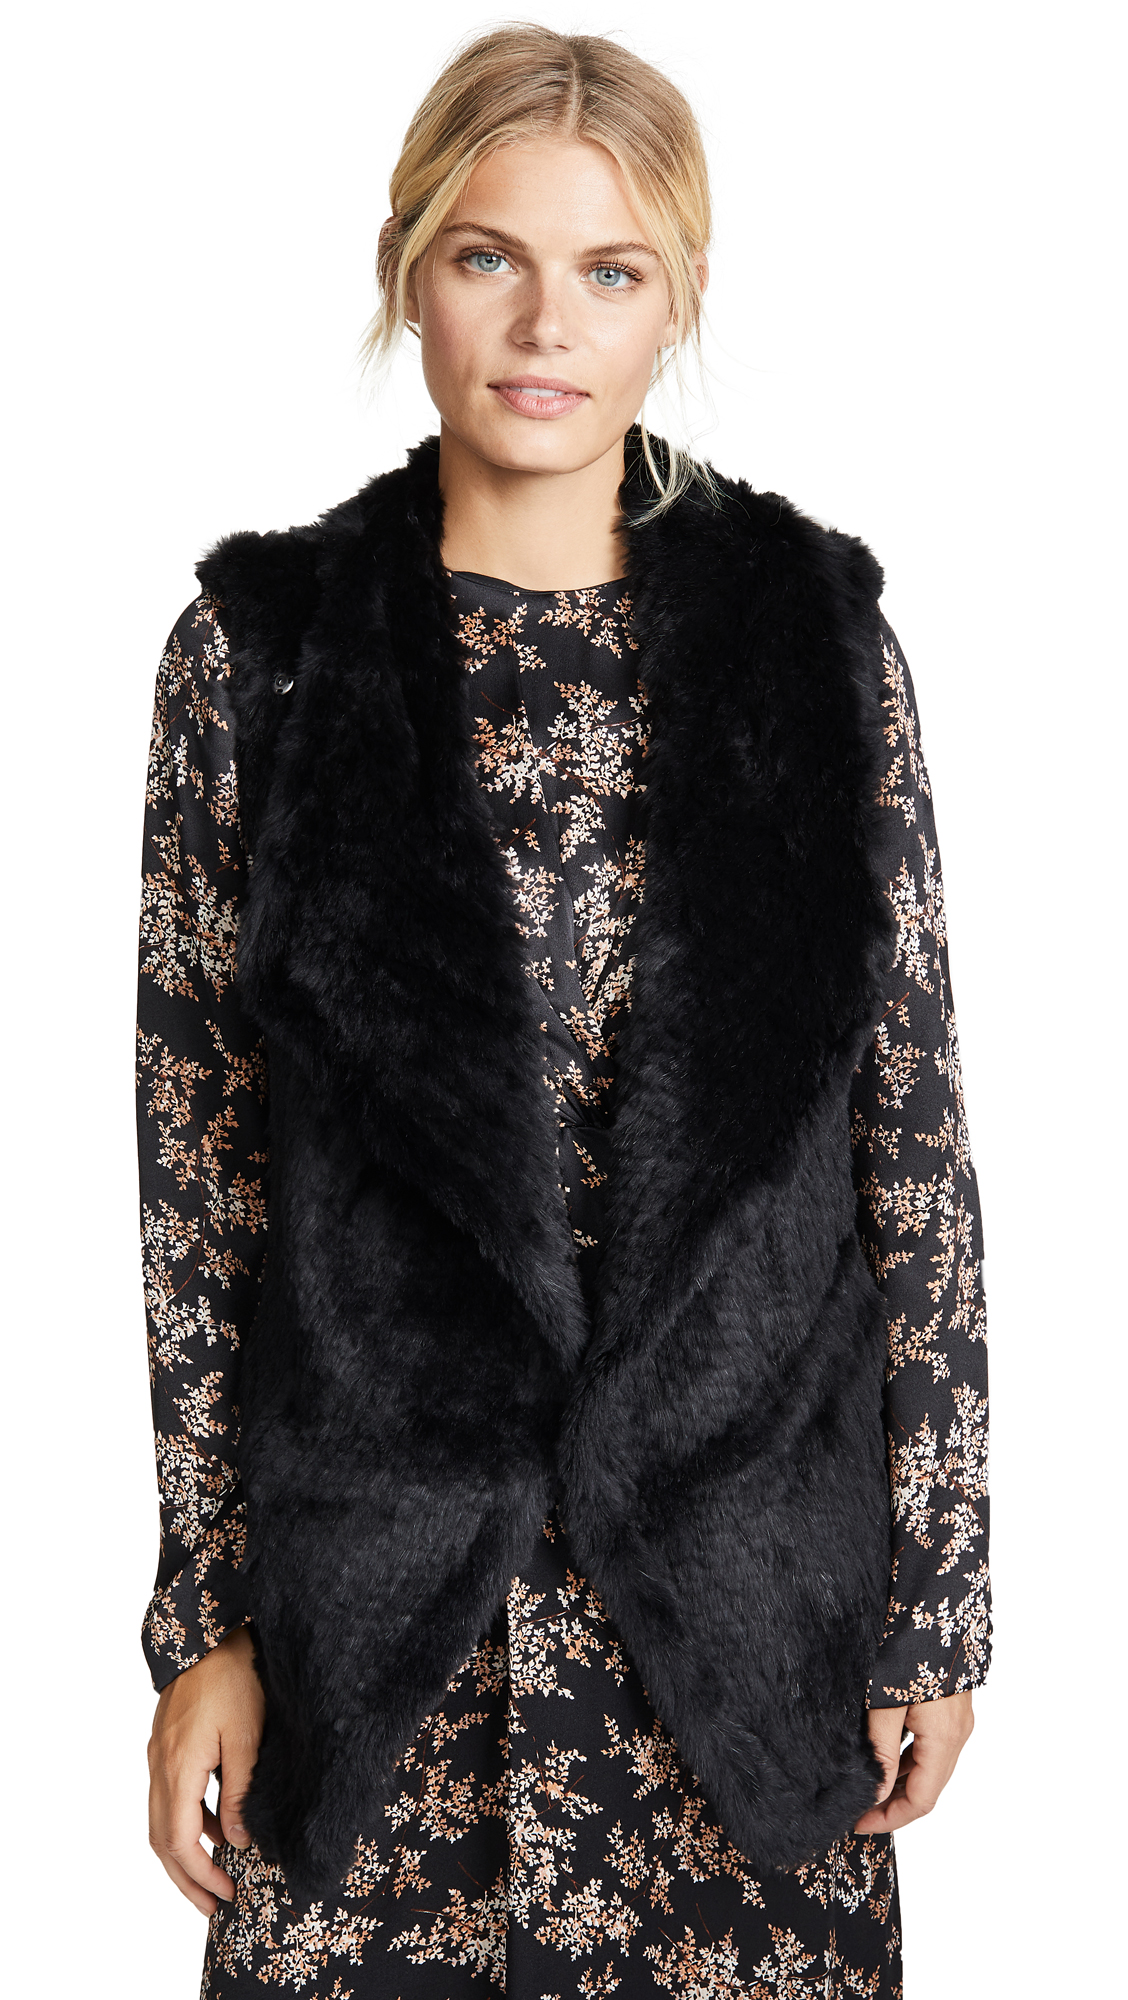 JUNE Asymmetric Fur Vest in Black